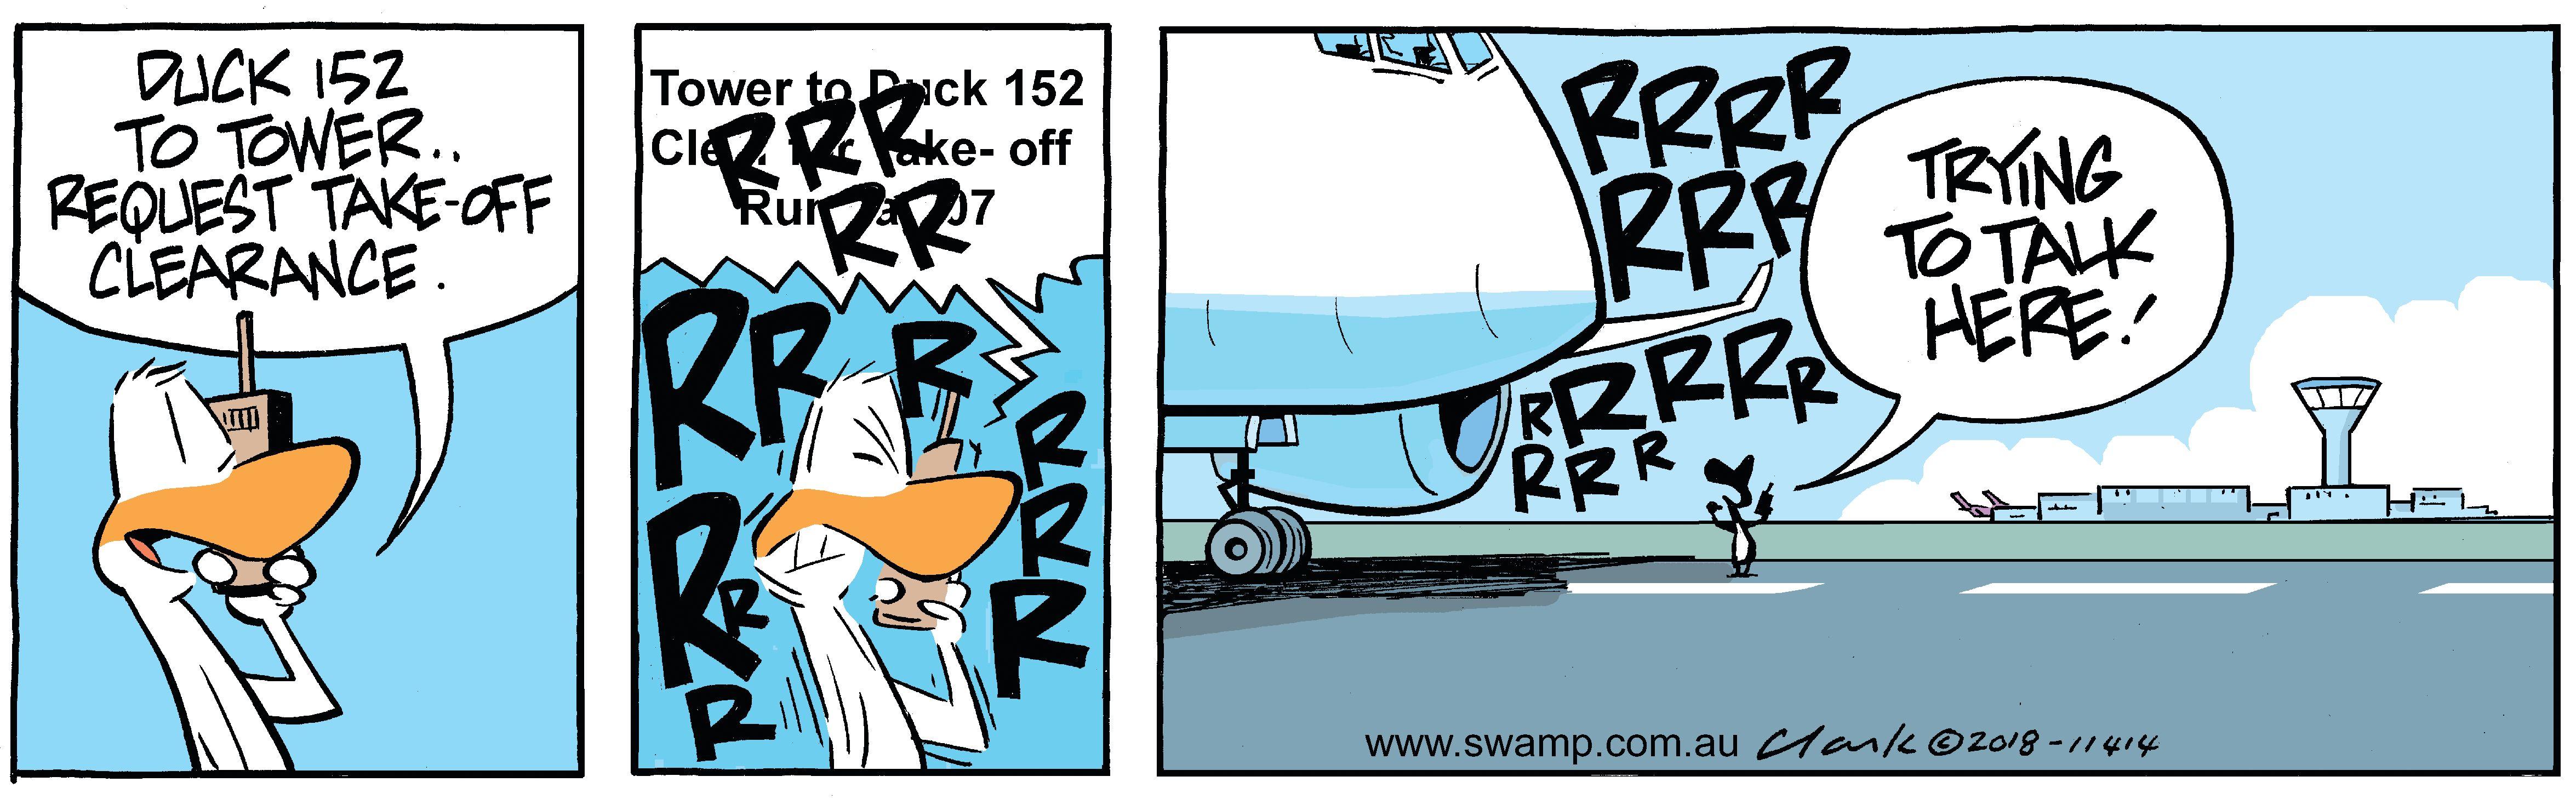 Swamp Duck Clearance Comic